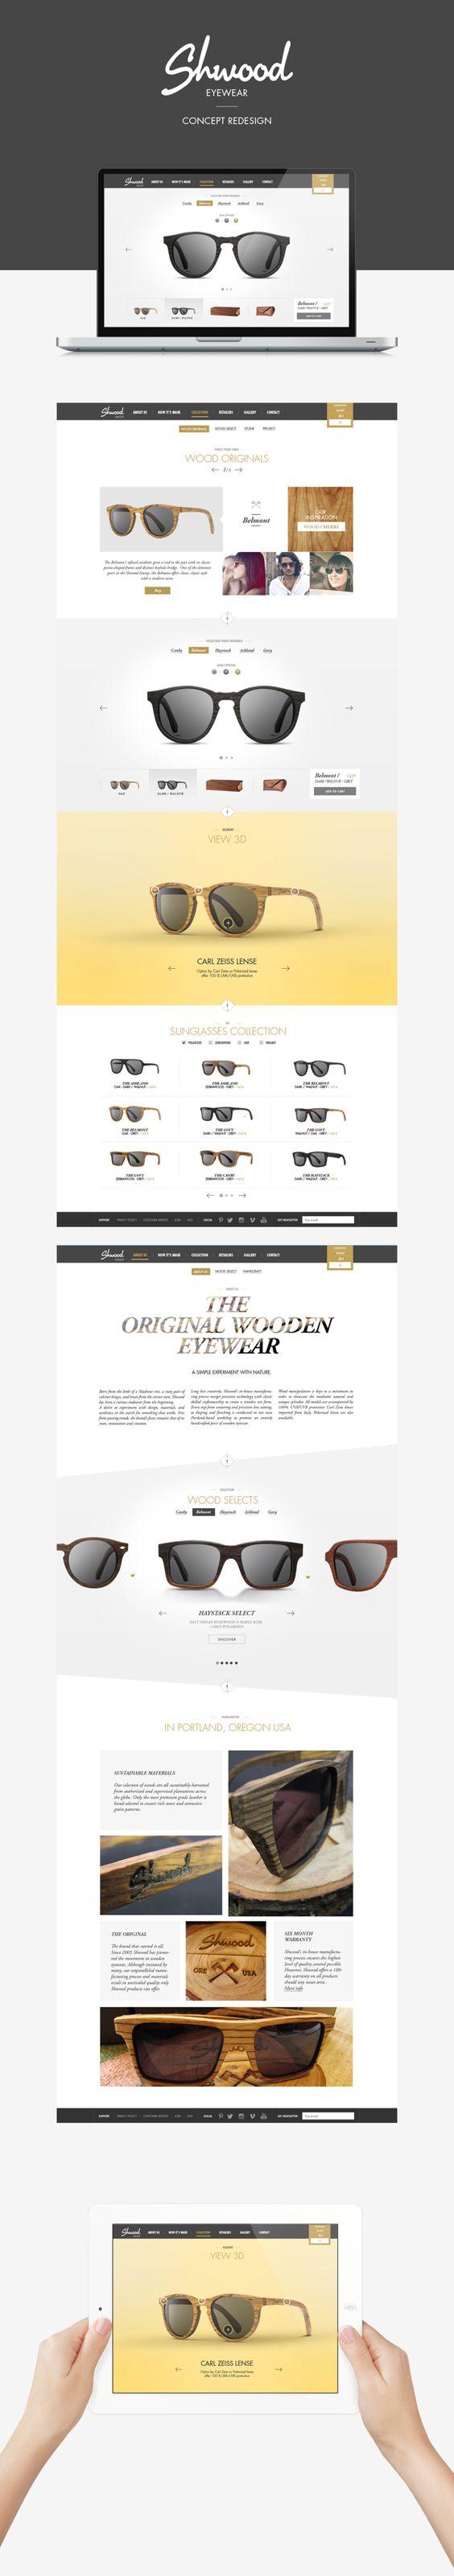 Shwood sunglasses - eshop Concept Redesign by Manuel Vélin, via Behance